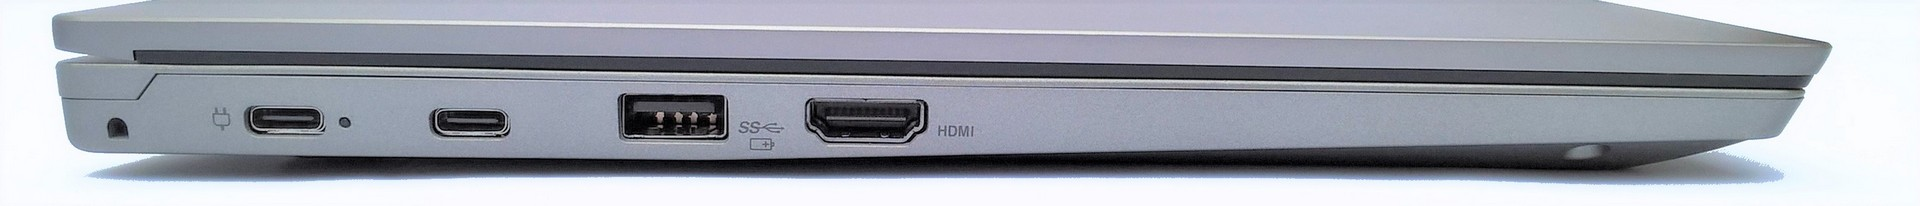 Lenovo ThinkPad L380 (i5-8250U, UHD620) Laptop Review